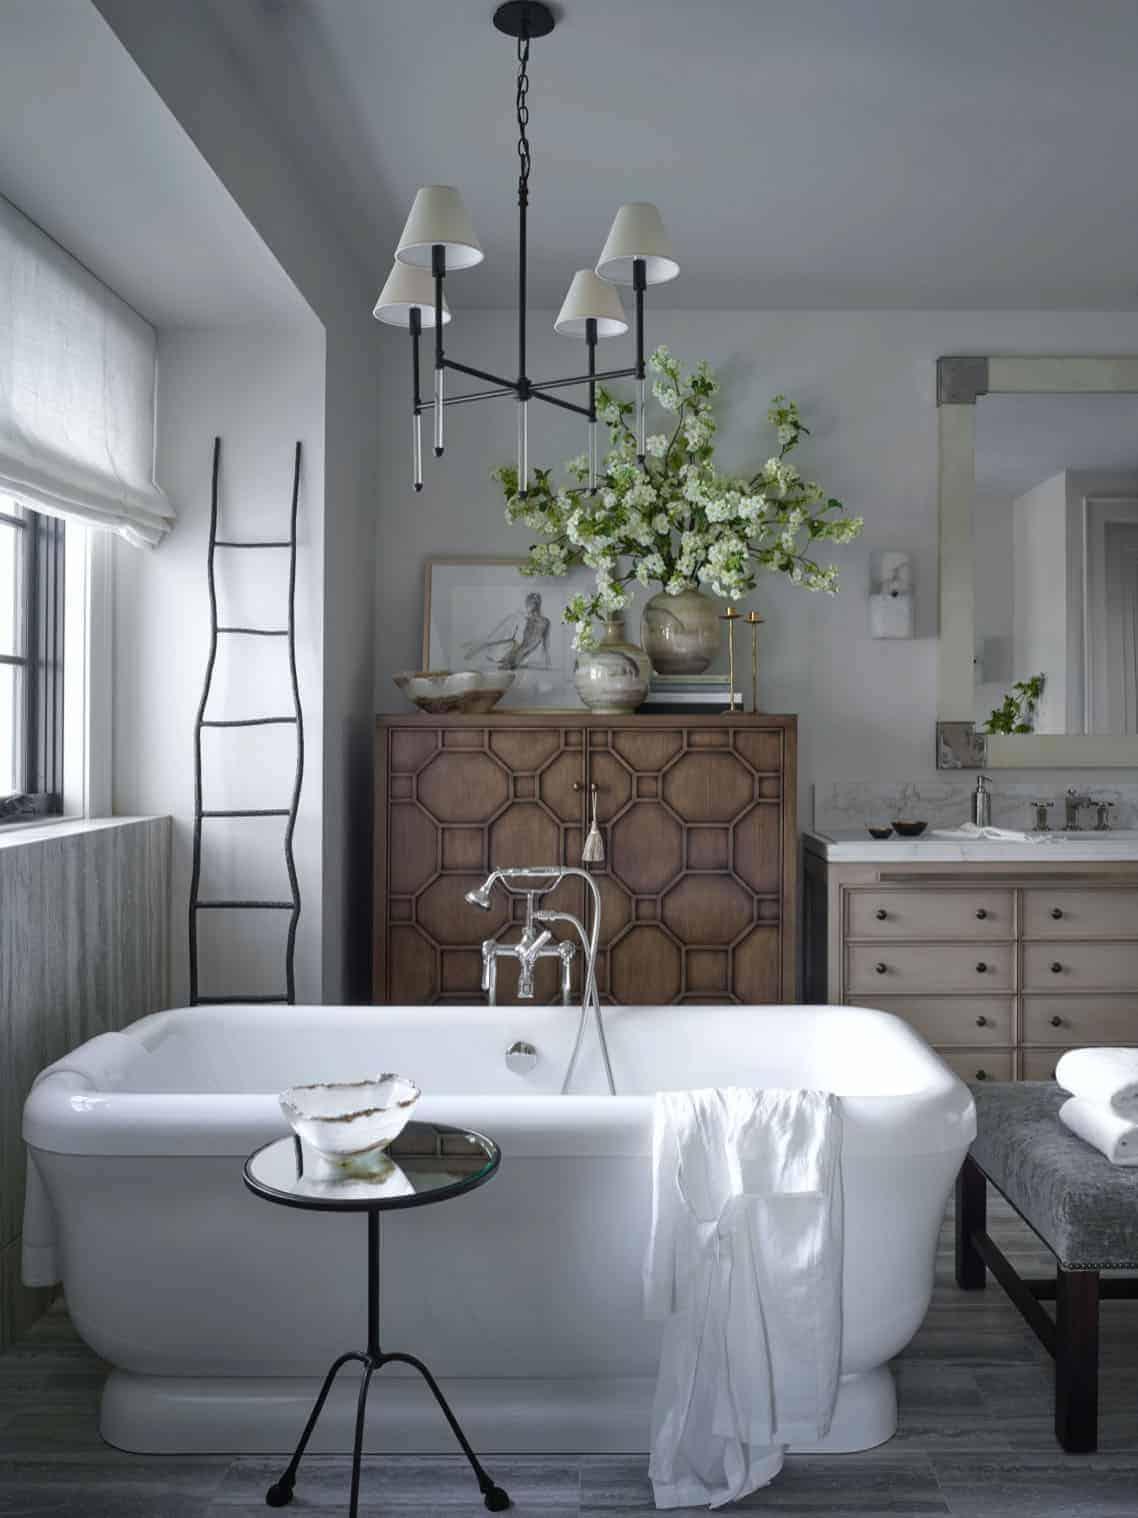 kupaonica u francuskom stilu